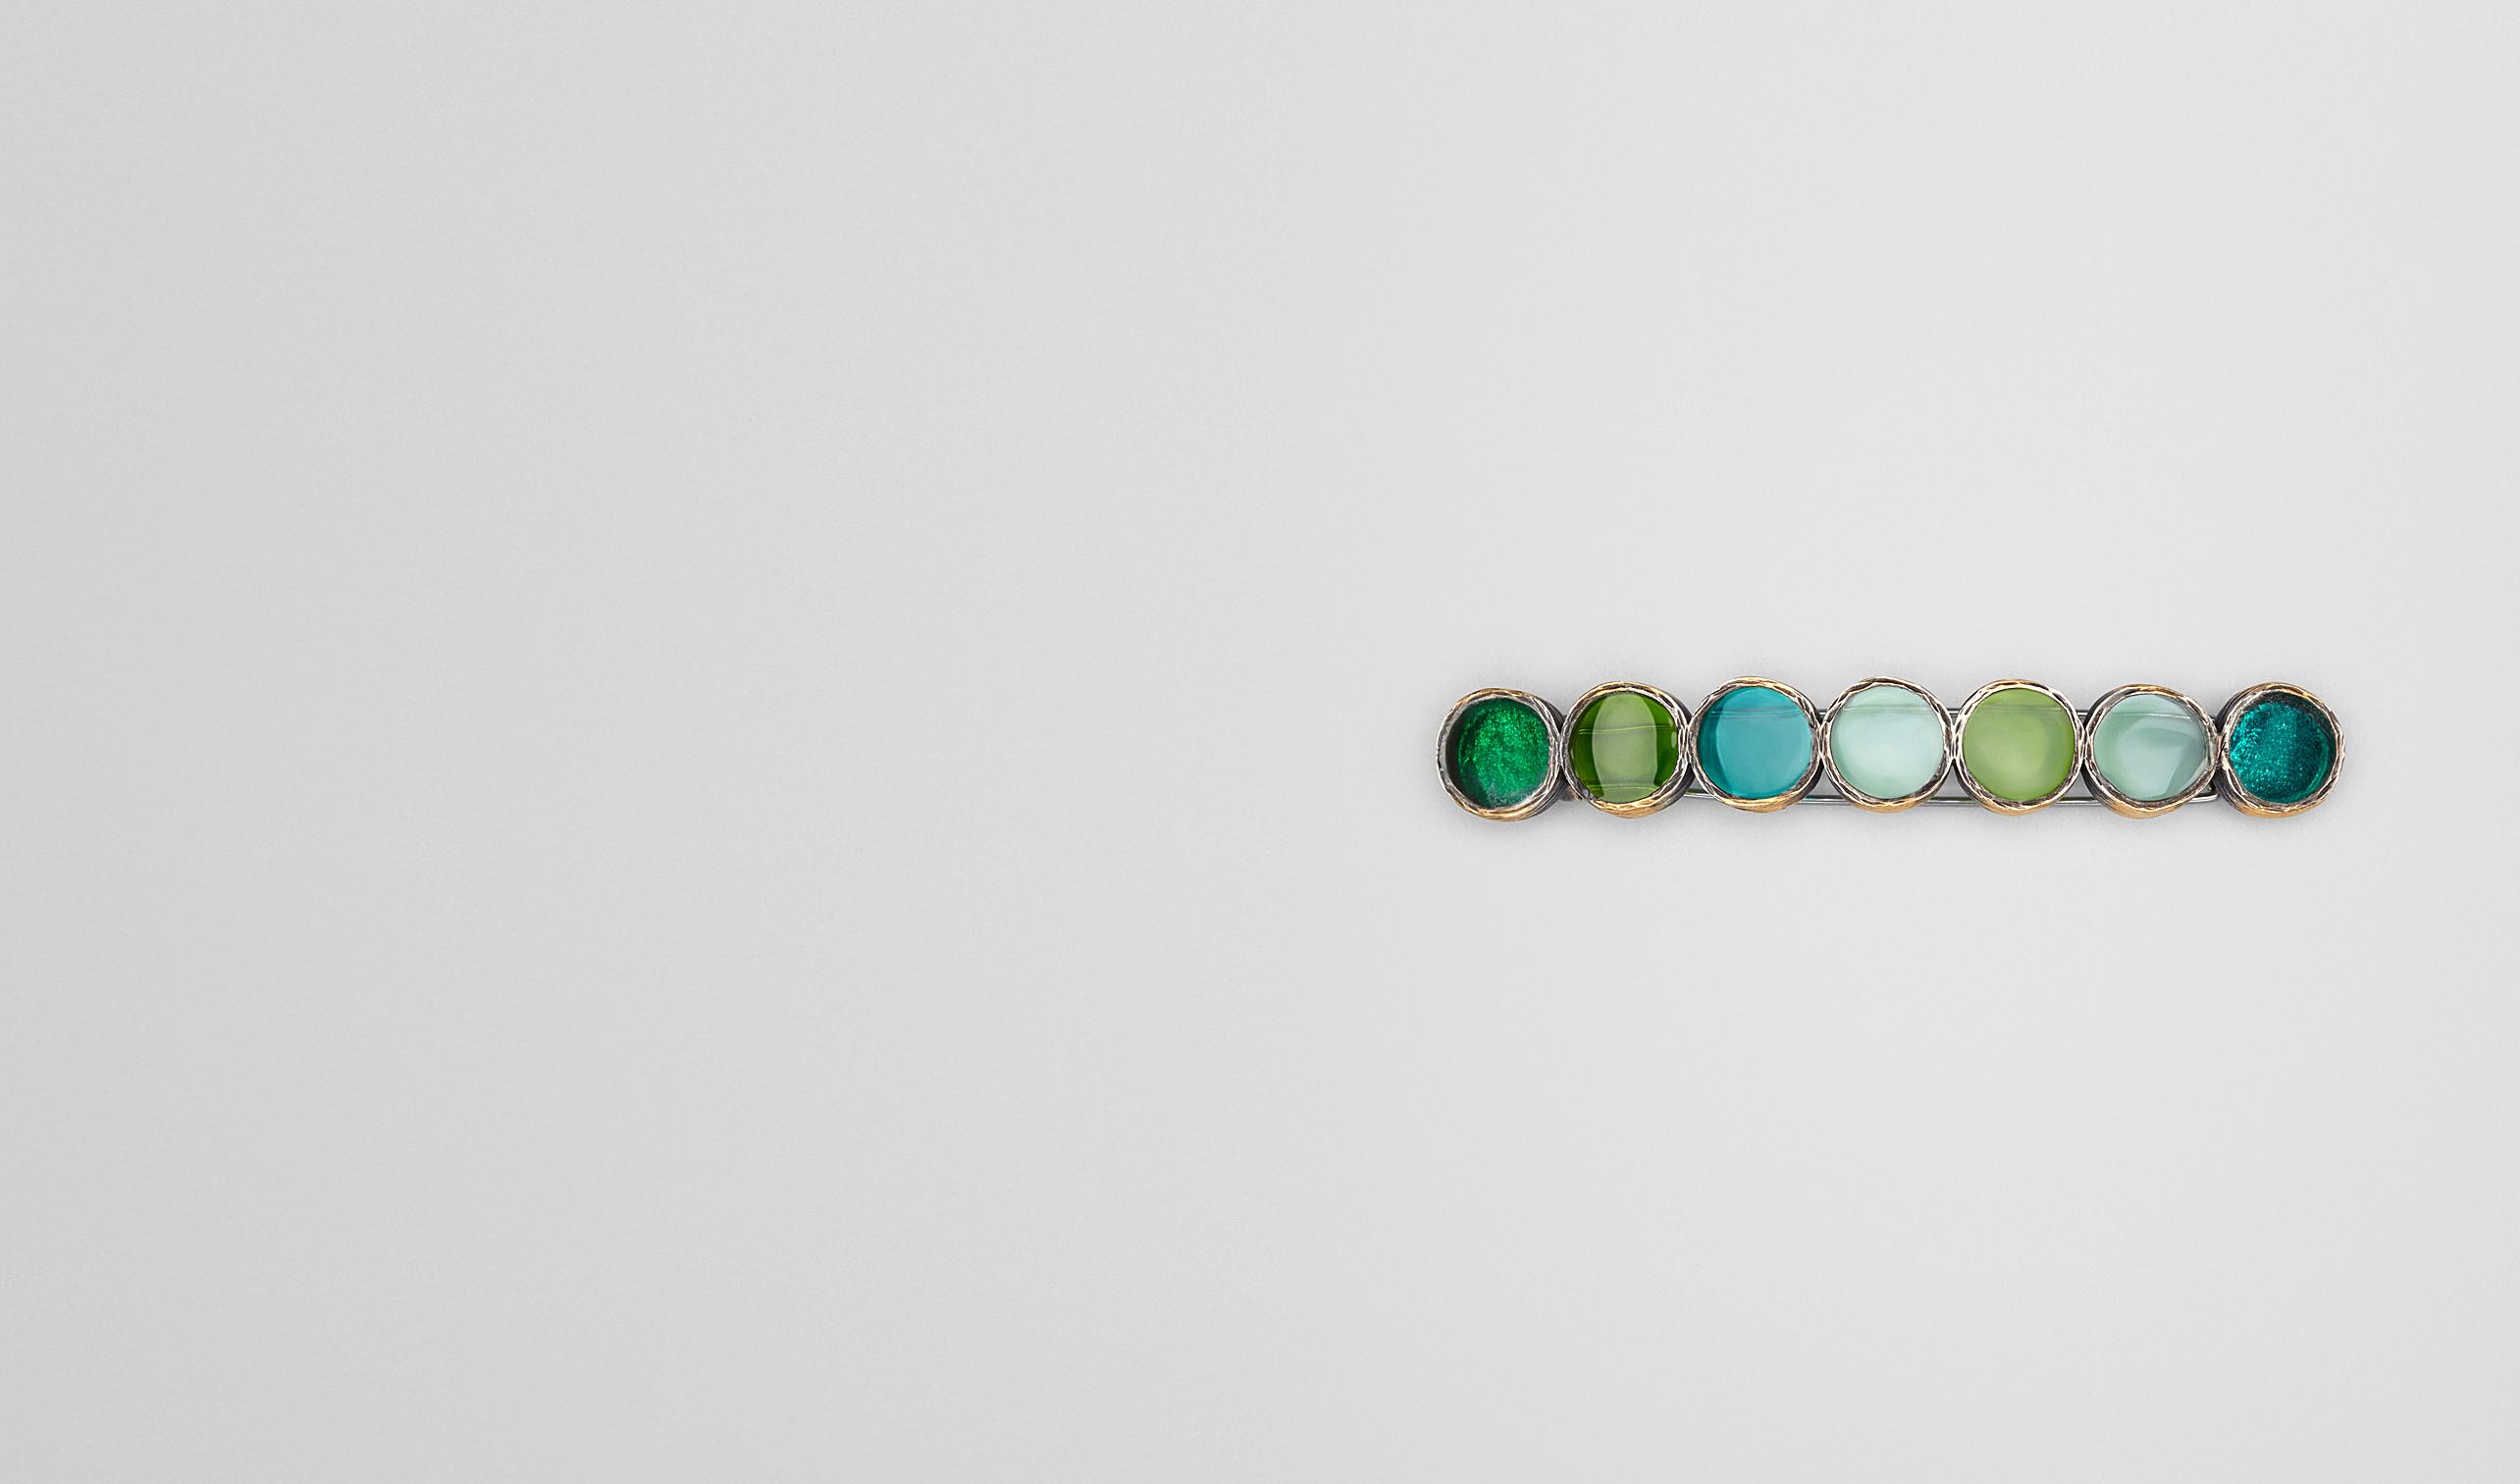 BOTTEGA VENETA Bracelet D HAIR CLIP IN MULTI GREEN ENAMEL SILVER, YELLOW GOLD ACCENTS pl